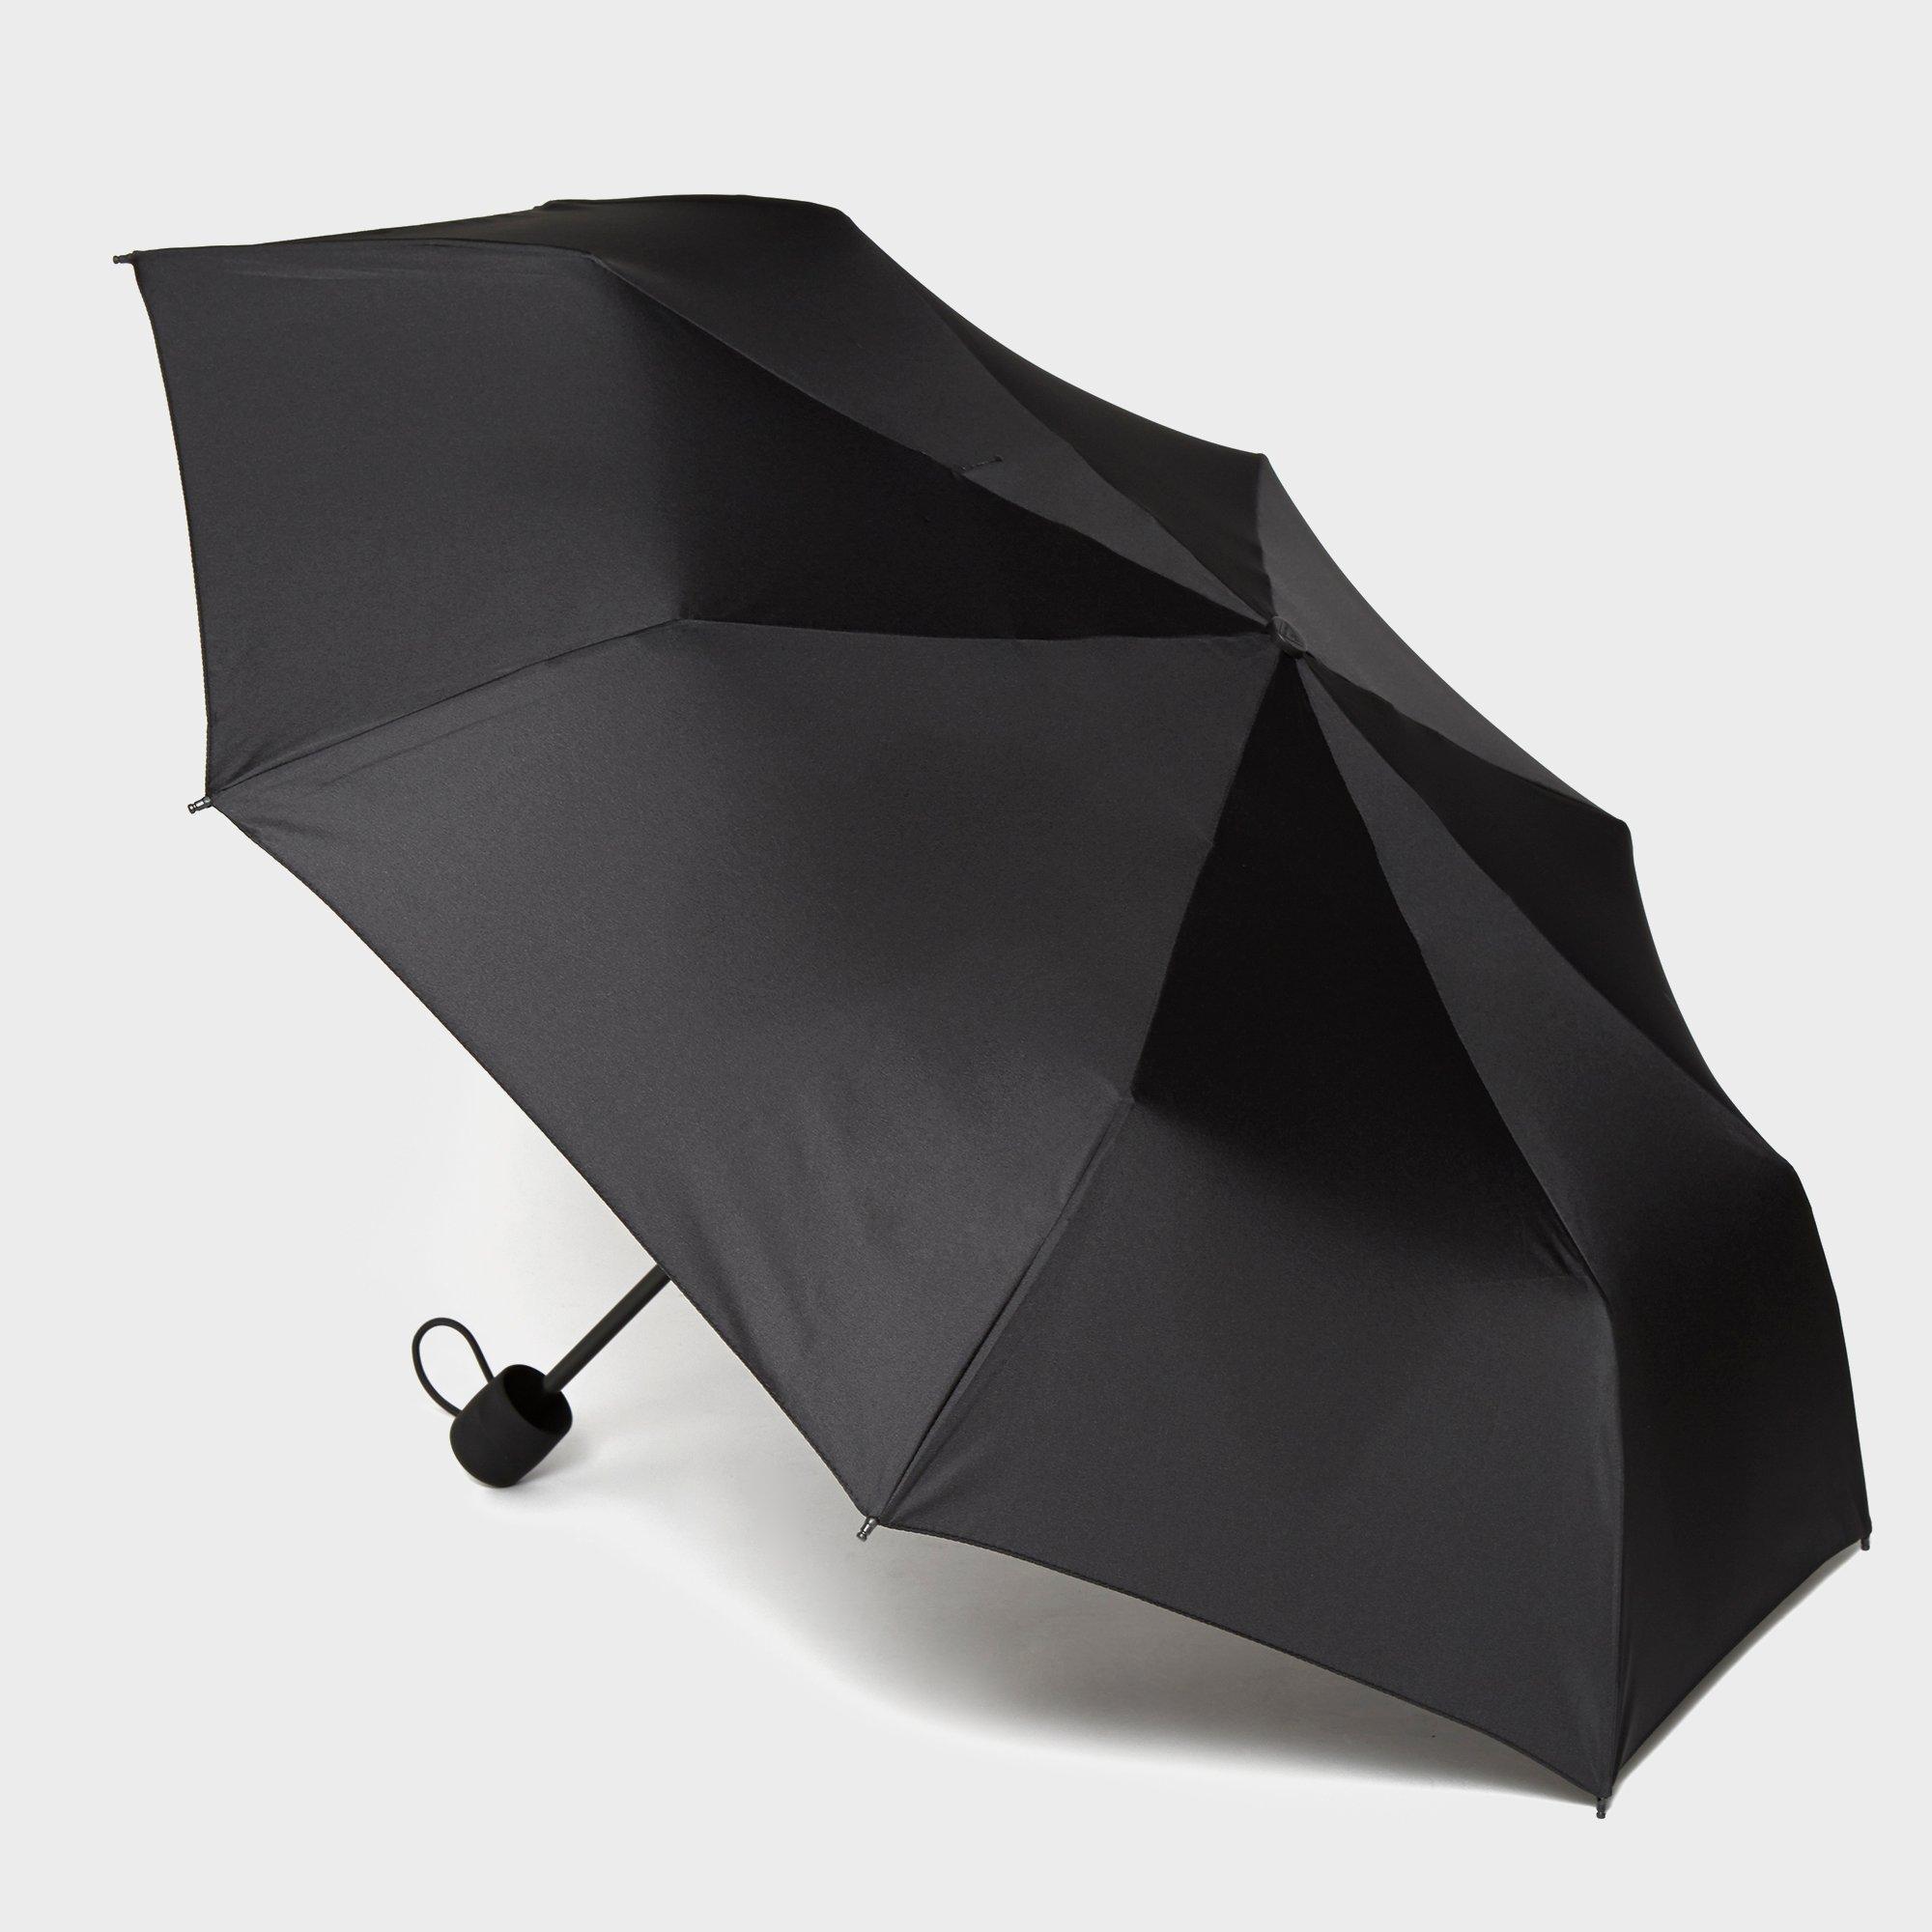 Fulton Fulton Hurricane Umbrella - Black, Black